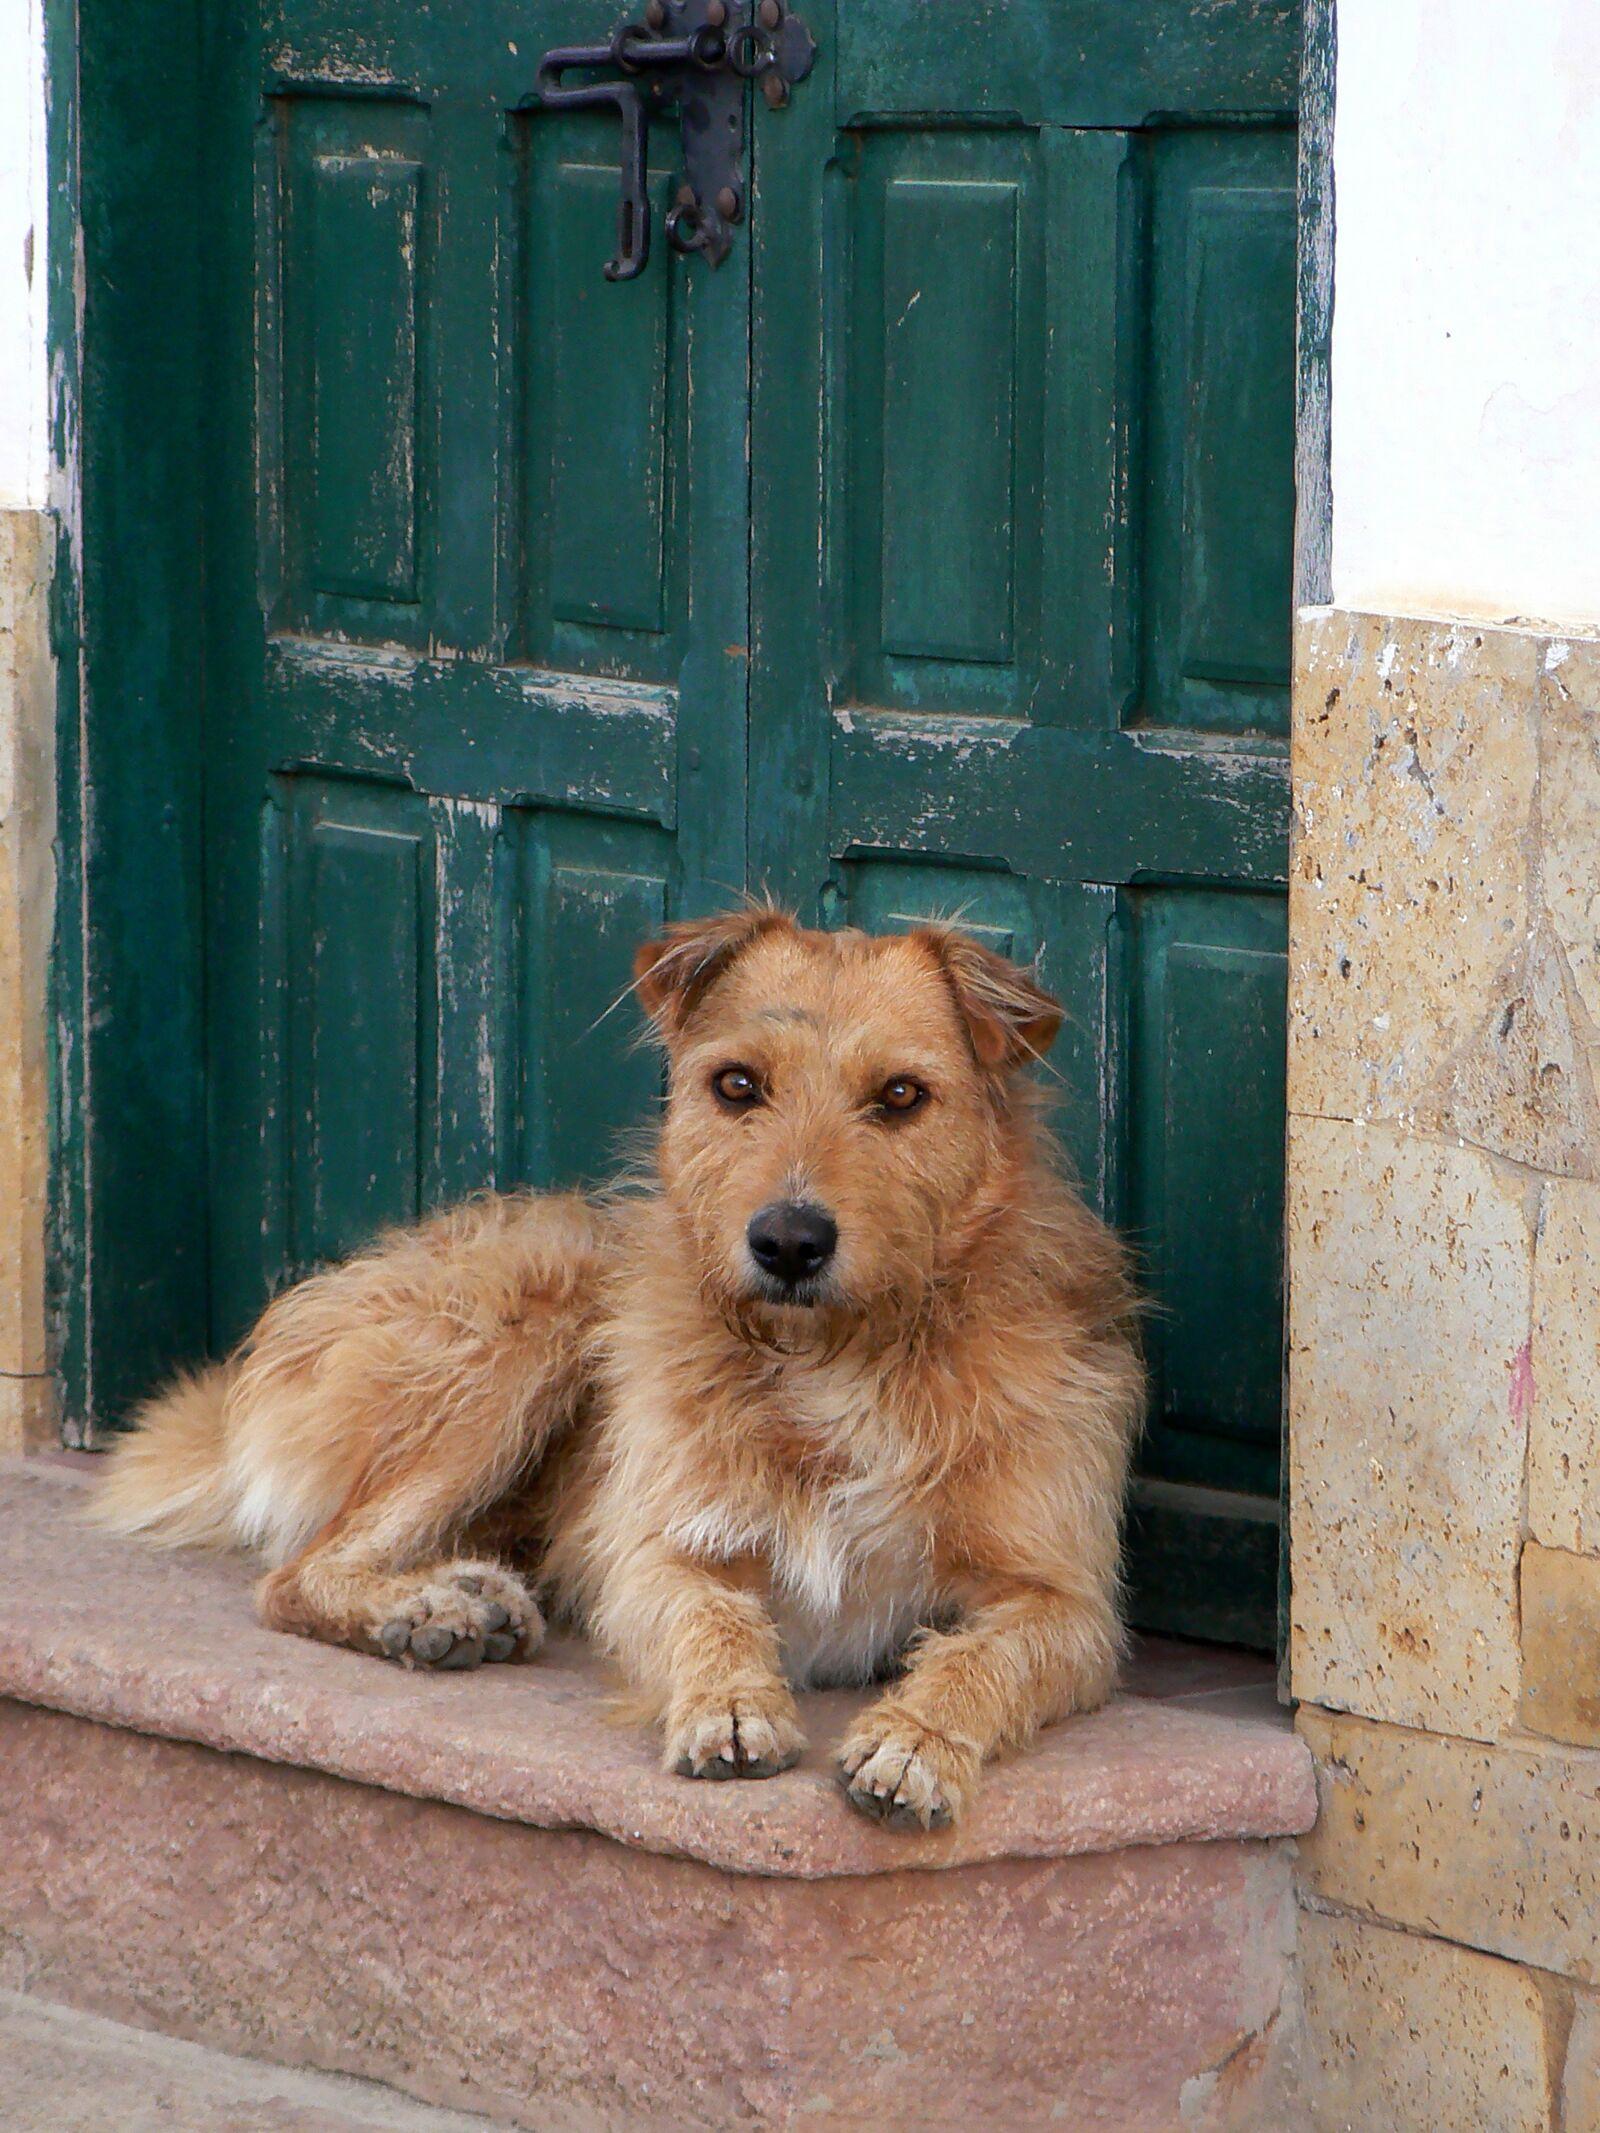 "Panasonic DMC-FZ7 sample photo. ""Villa de leyva, dog"" photography"